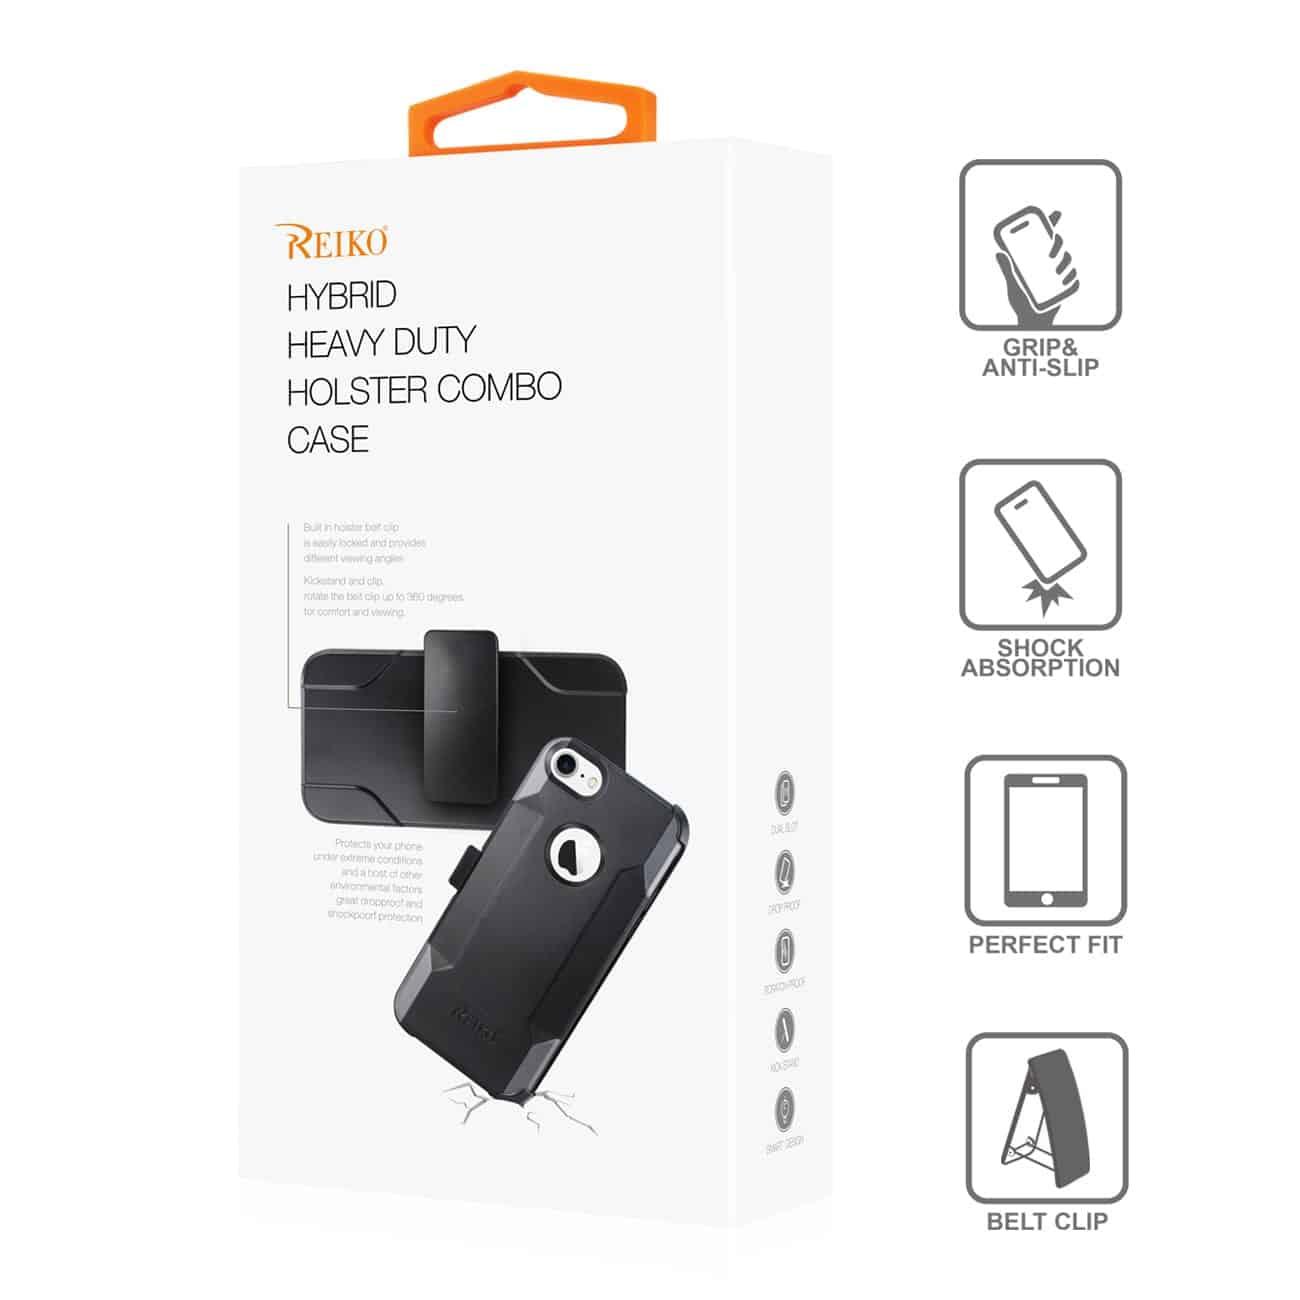 Samsung Galaxy S9 3-In-1 Hybrid Heavy Duty Holster Combo Case In Burgundy